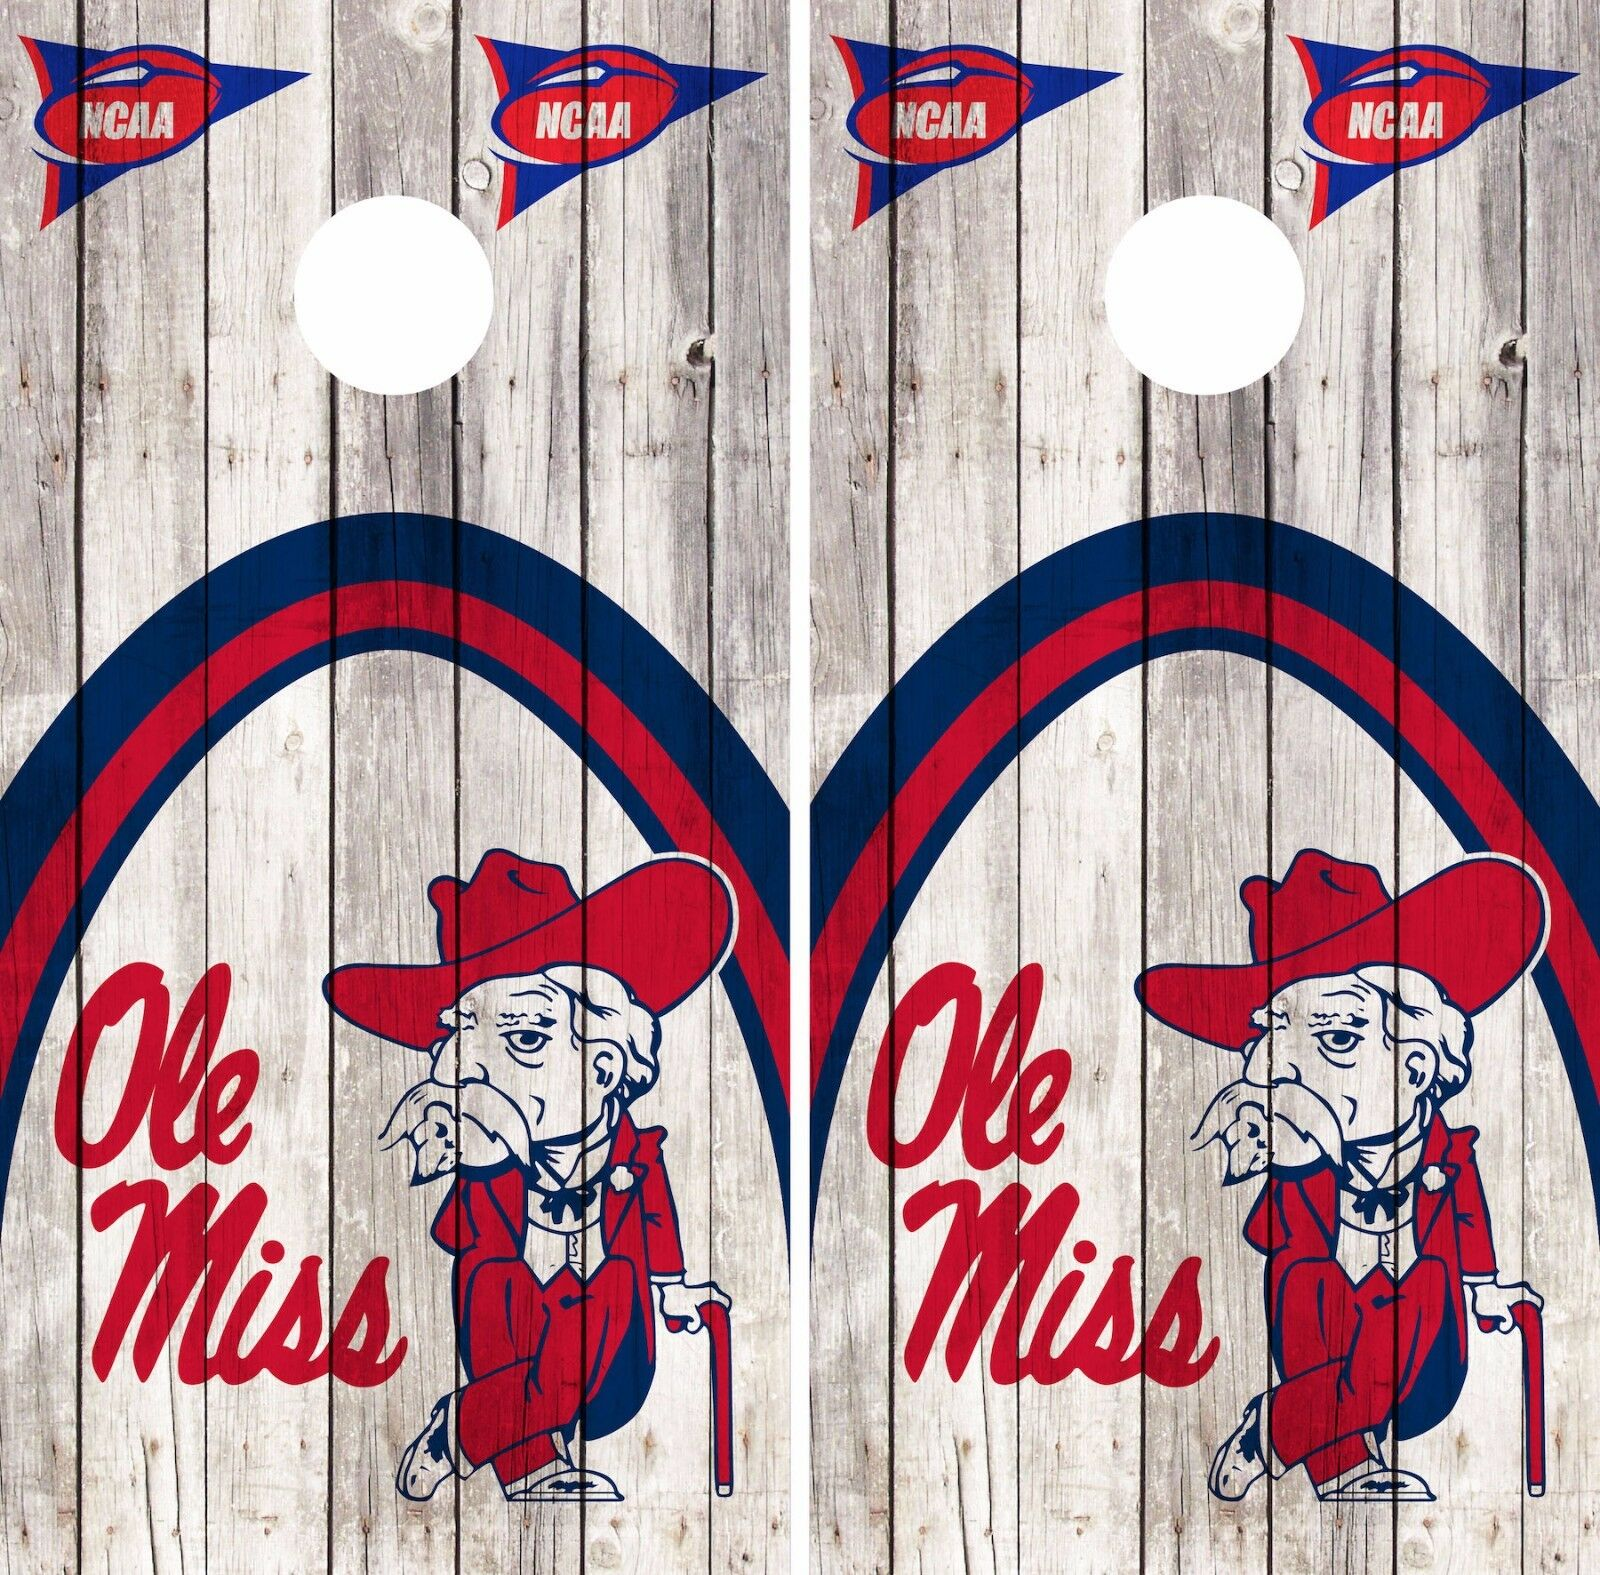 Ole Miss Cornhole Skin Wrap NCAA College Vintage  Decal Vinyl Team Flag DR399  in stock